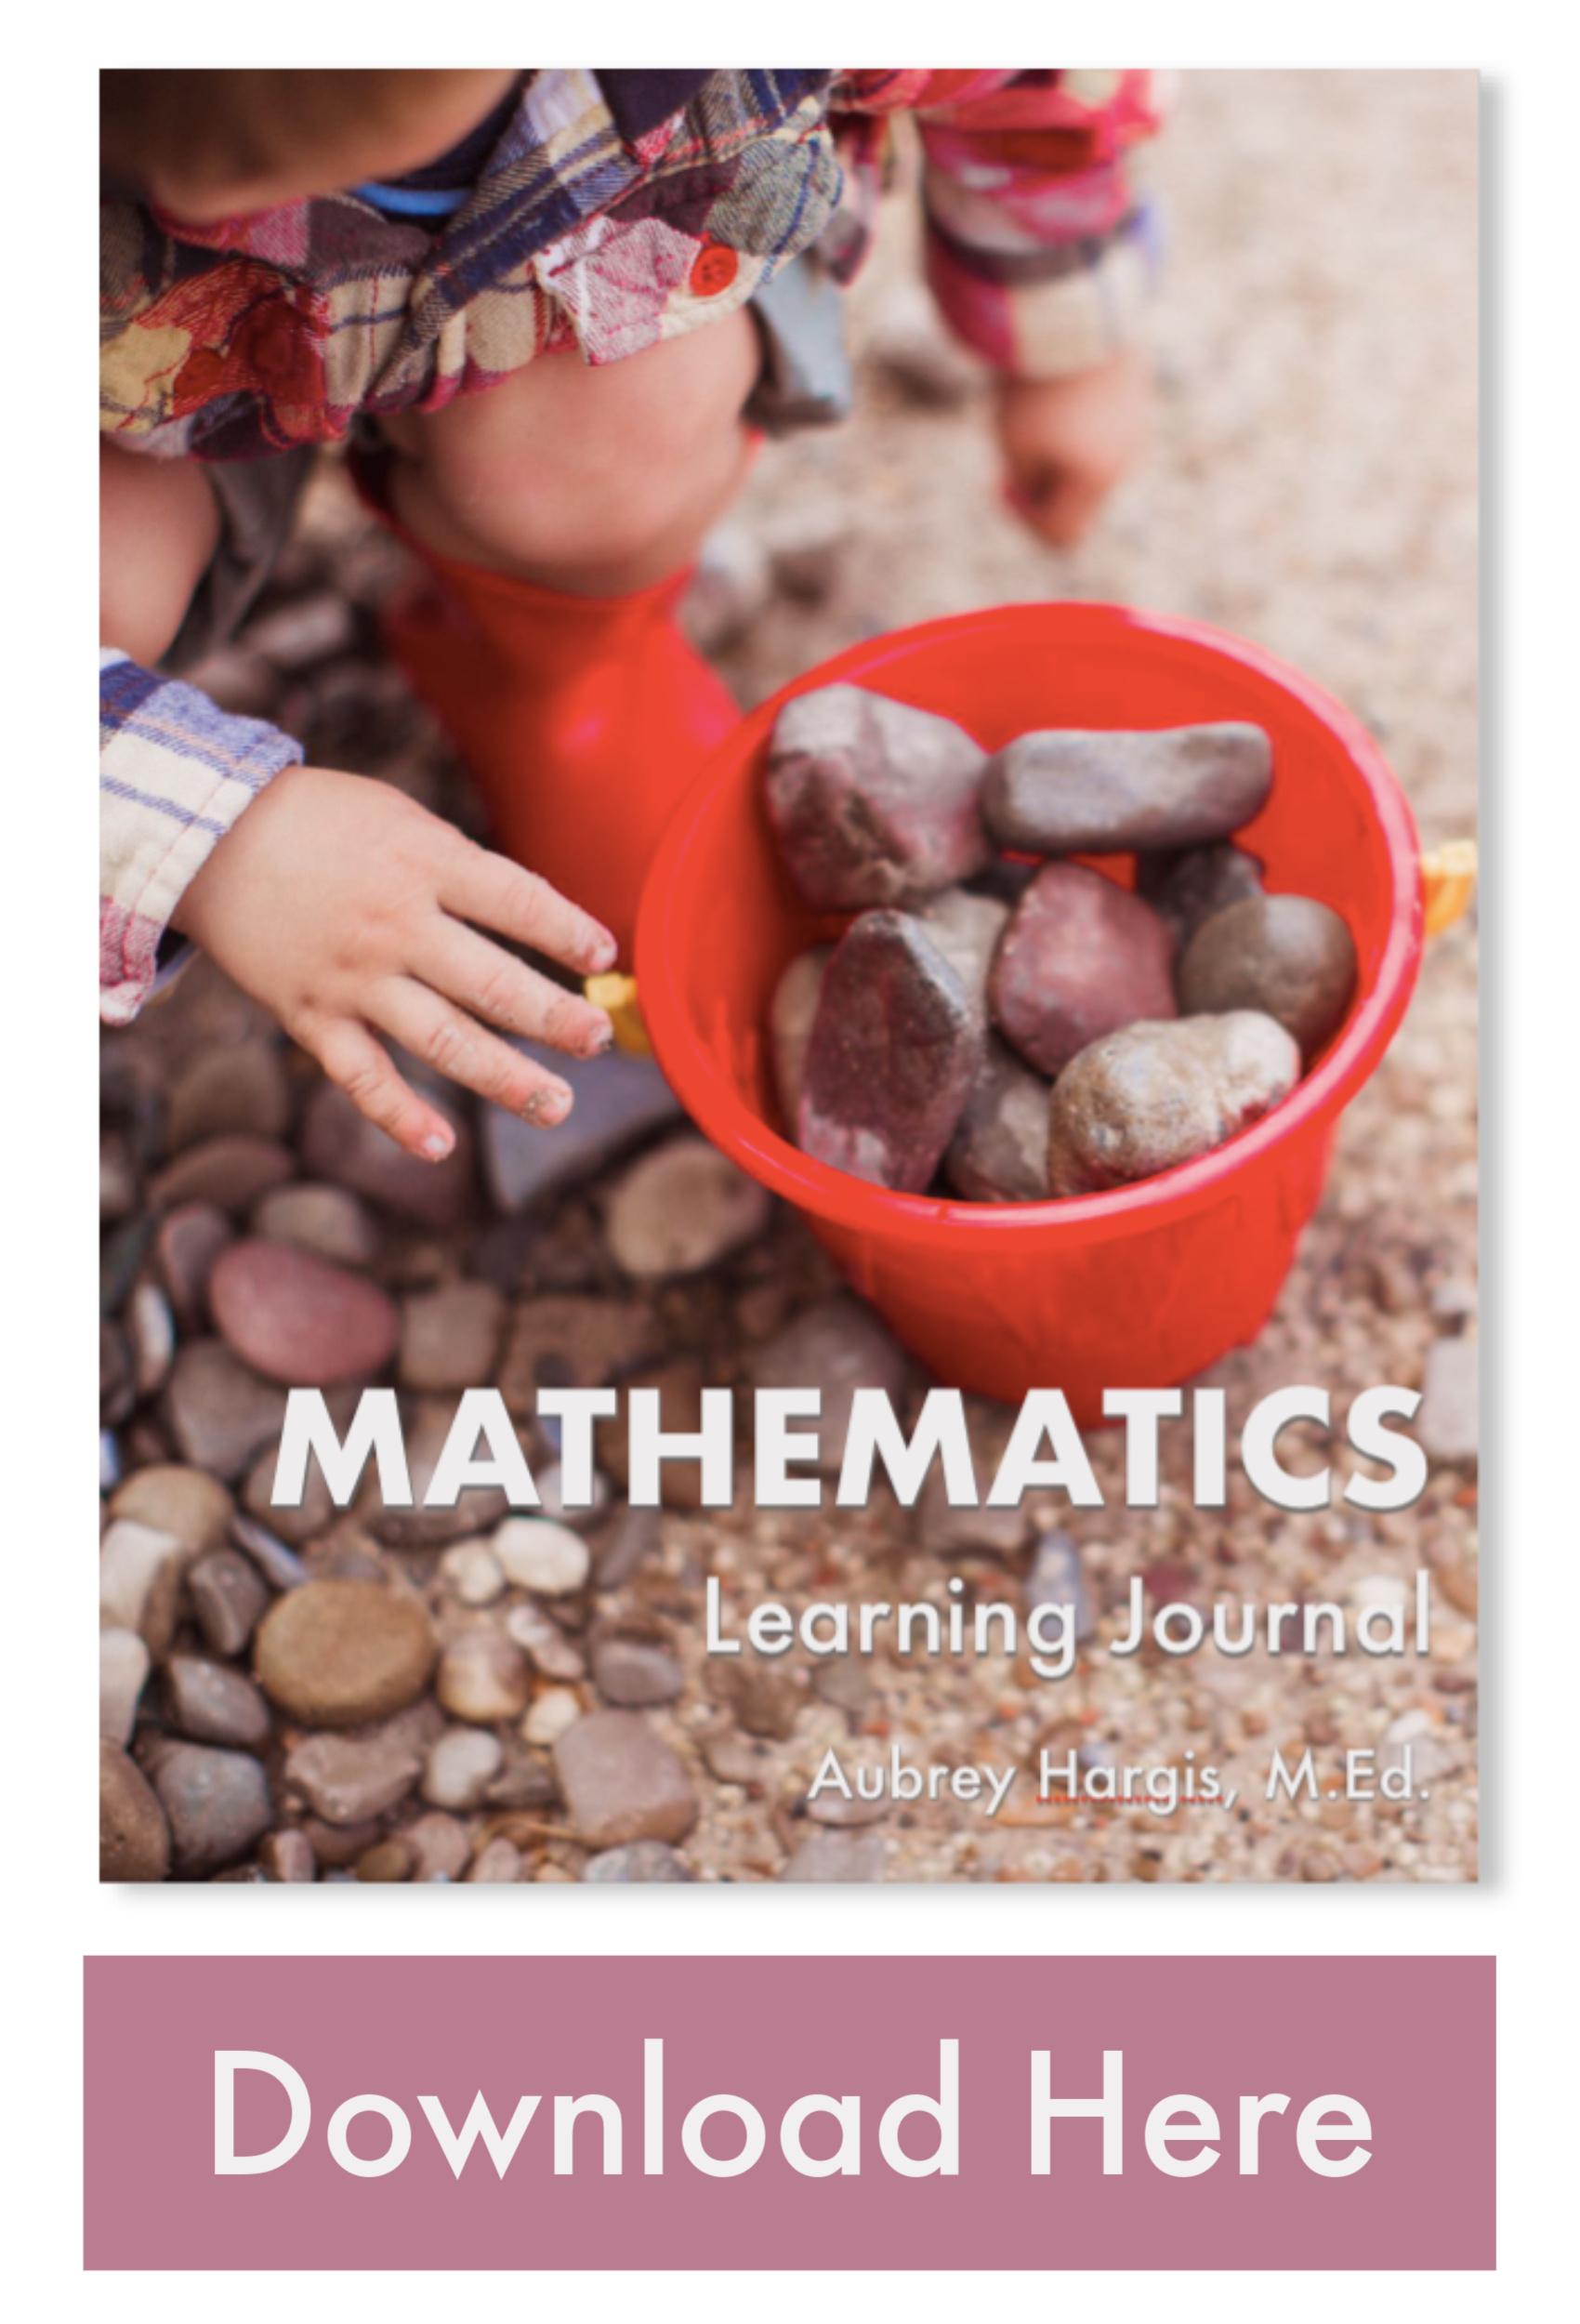 U5 Learning Journal Download Button.jpg